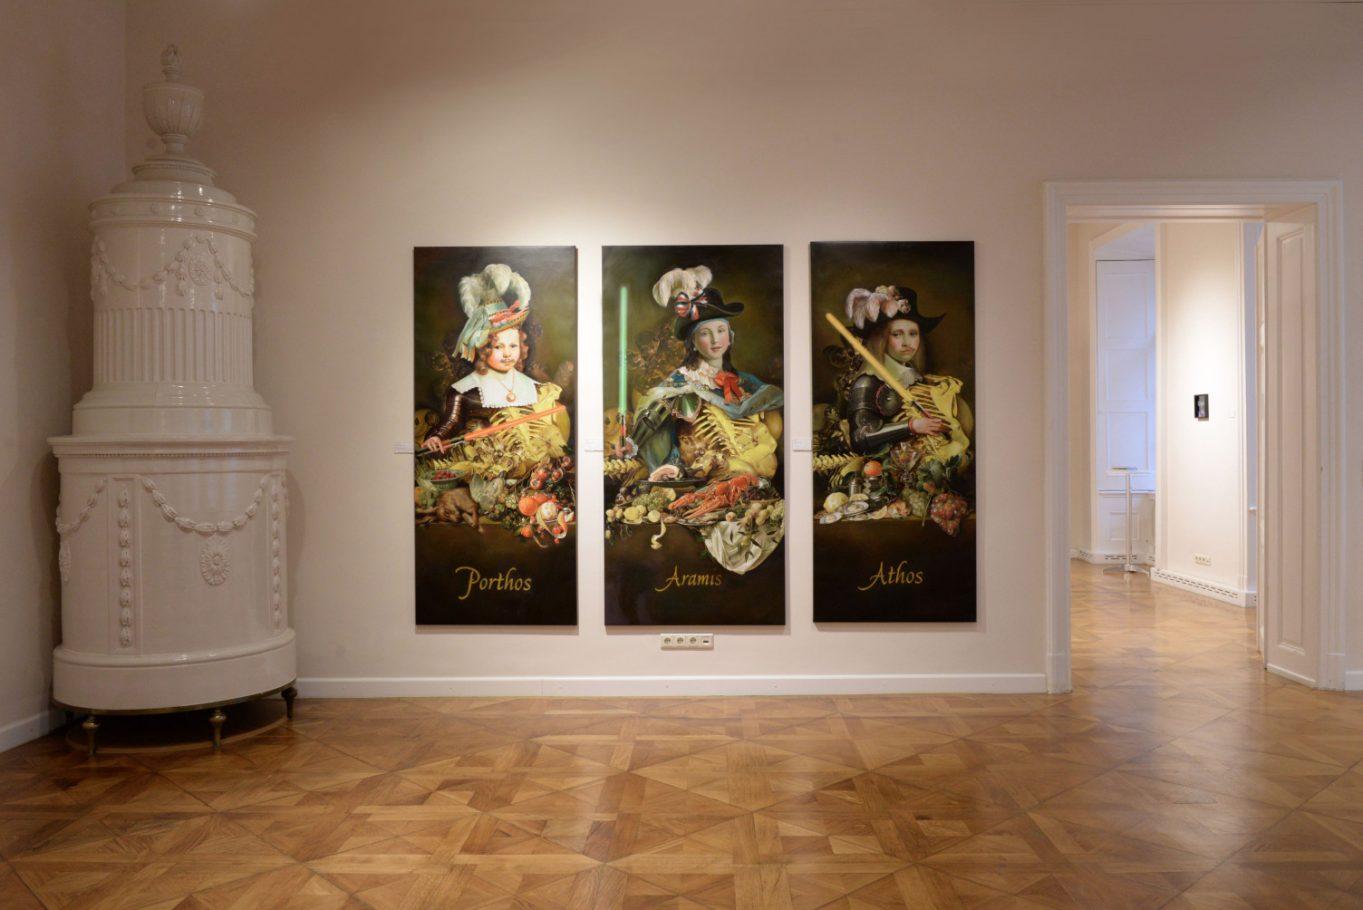 Austria Auction Company